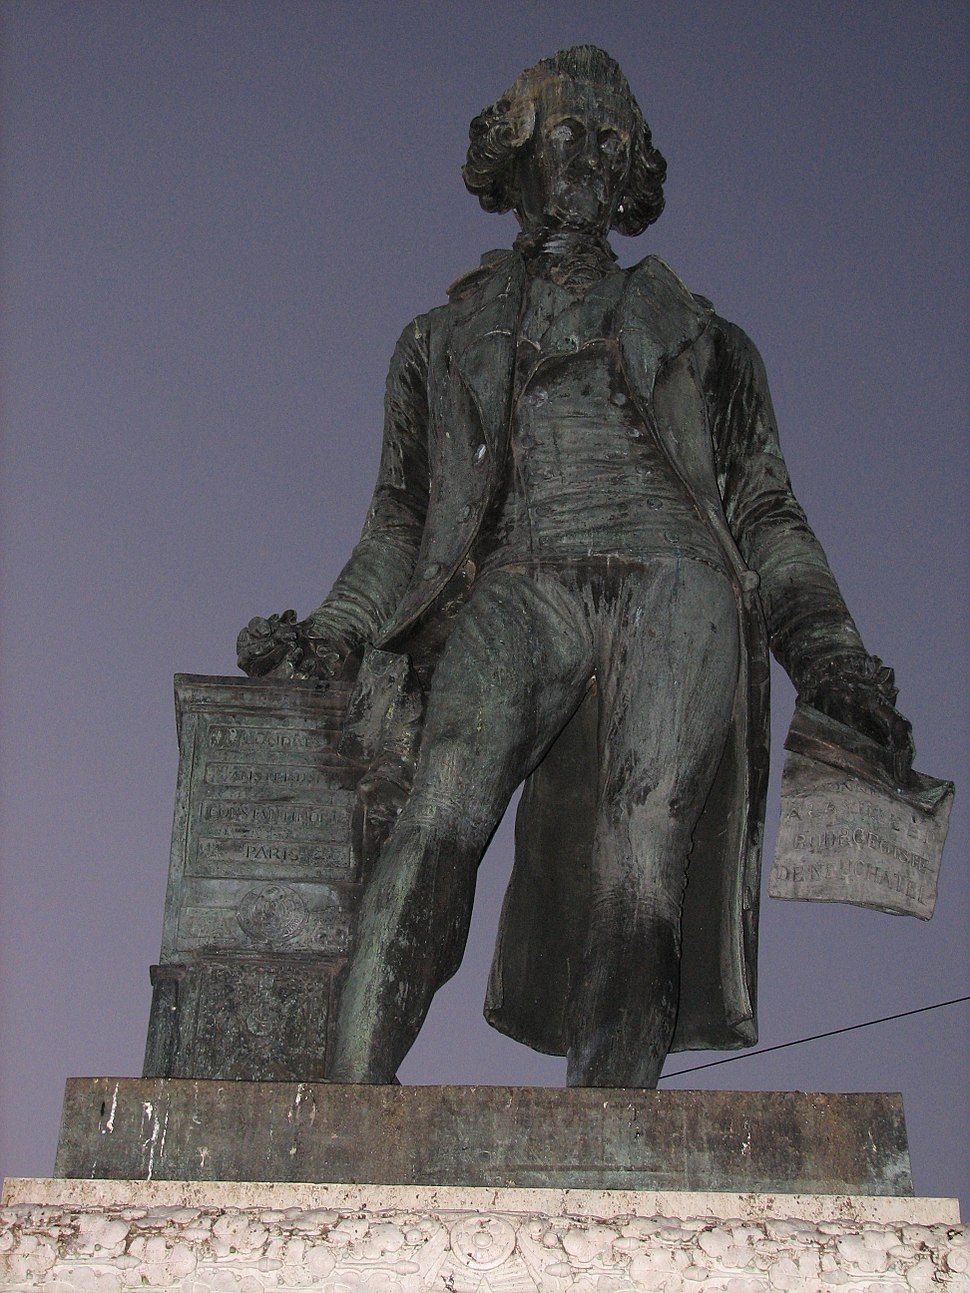 David de Pury Neuchatel